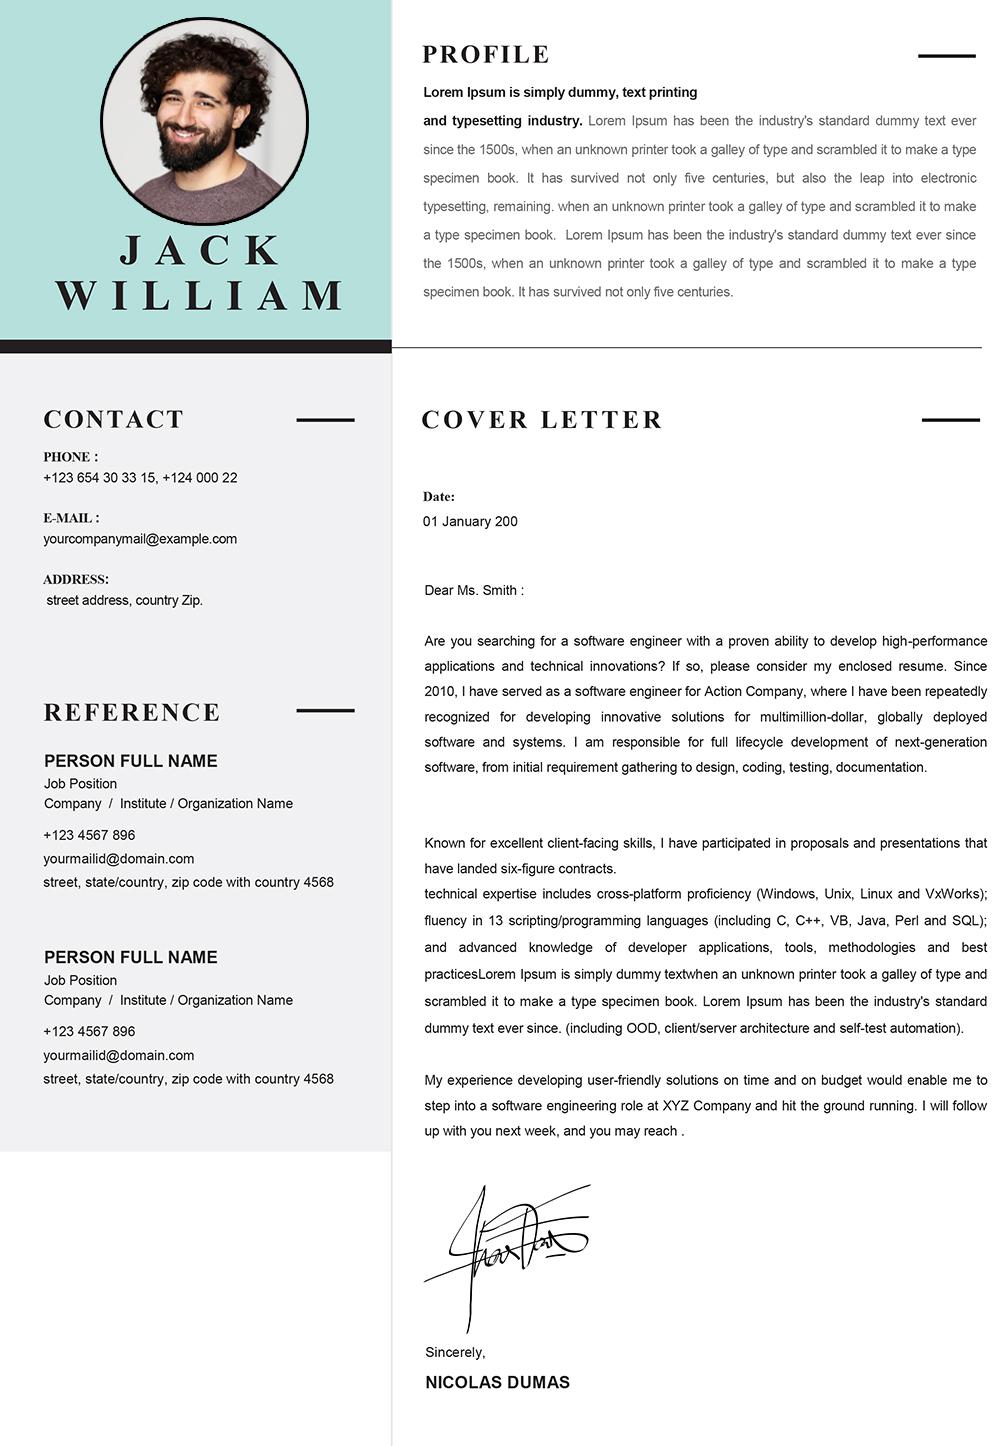 Modern Cover Letter Template from www.mycvstore.com